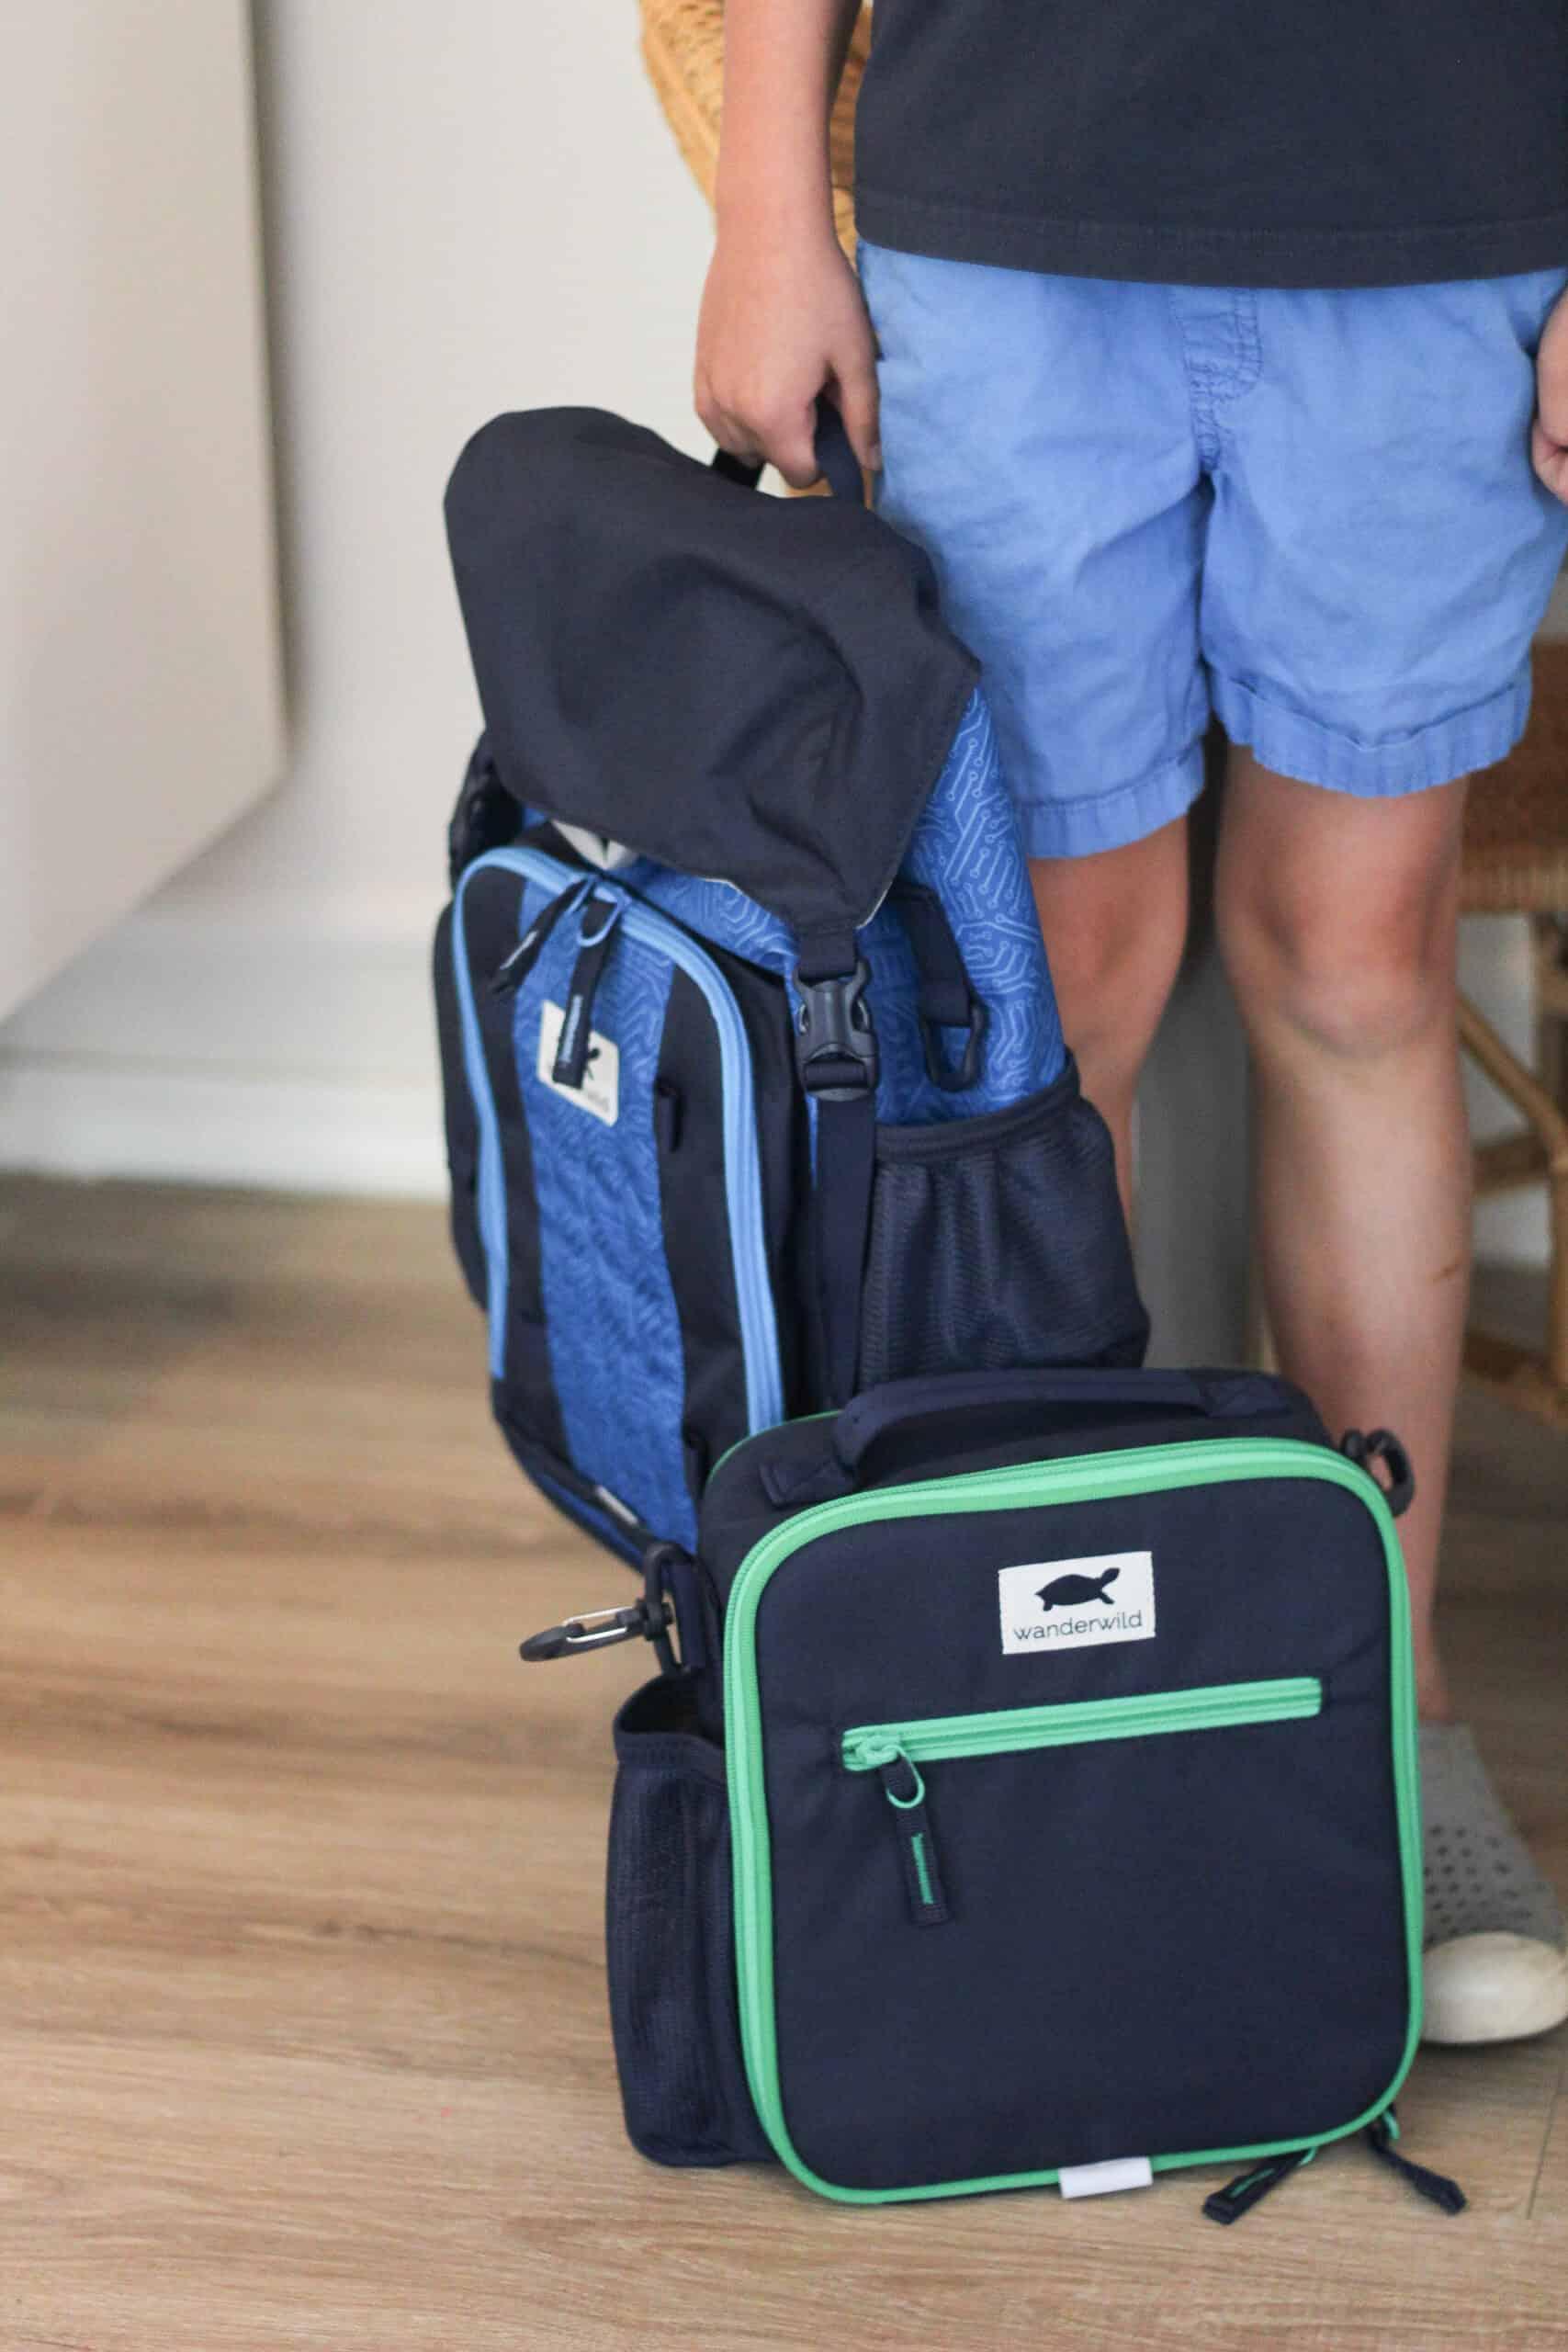 Wanderwild backpacks for kids